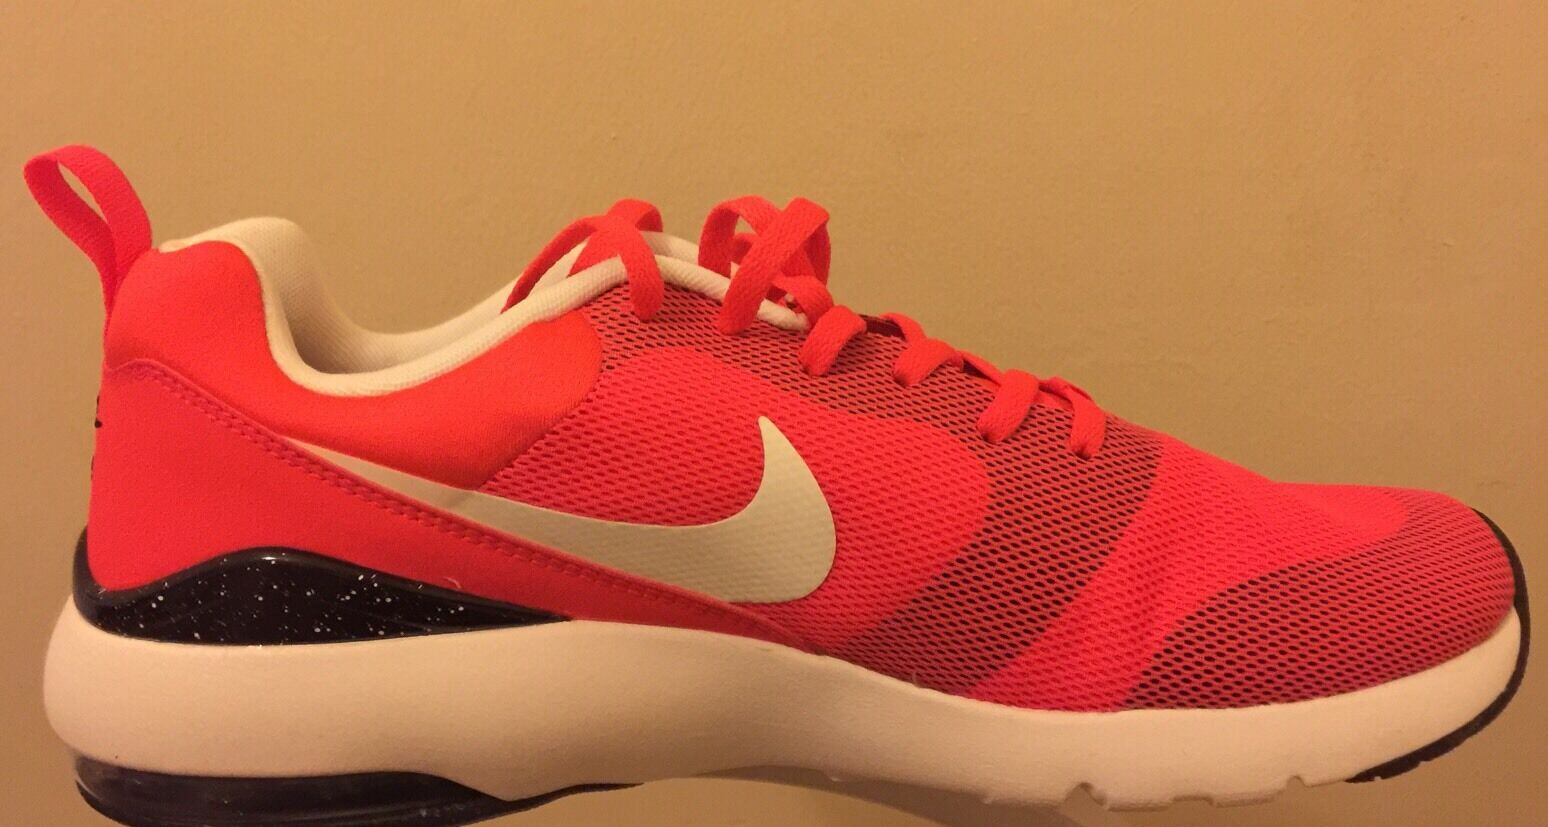 Nike Wmns Air Max Siren Siren Siren Size 7.5 Bnib 6edee6